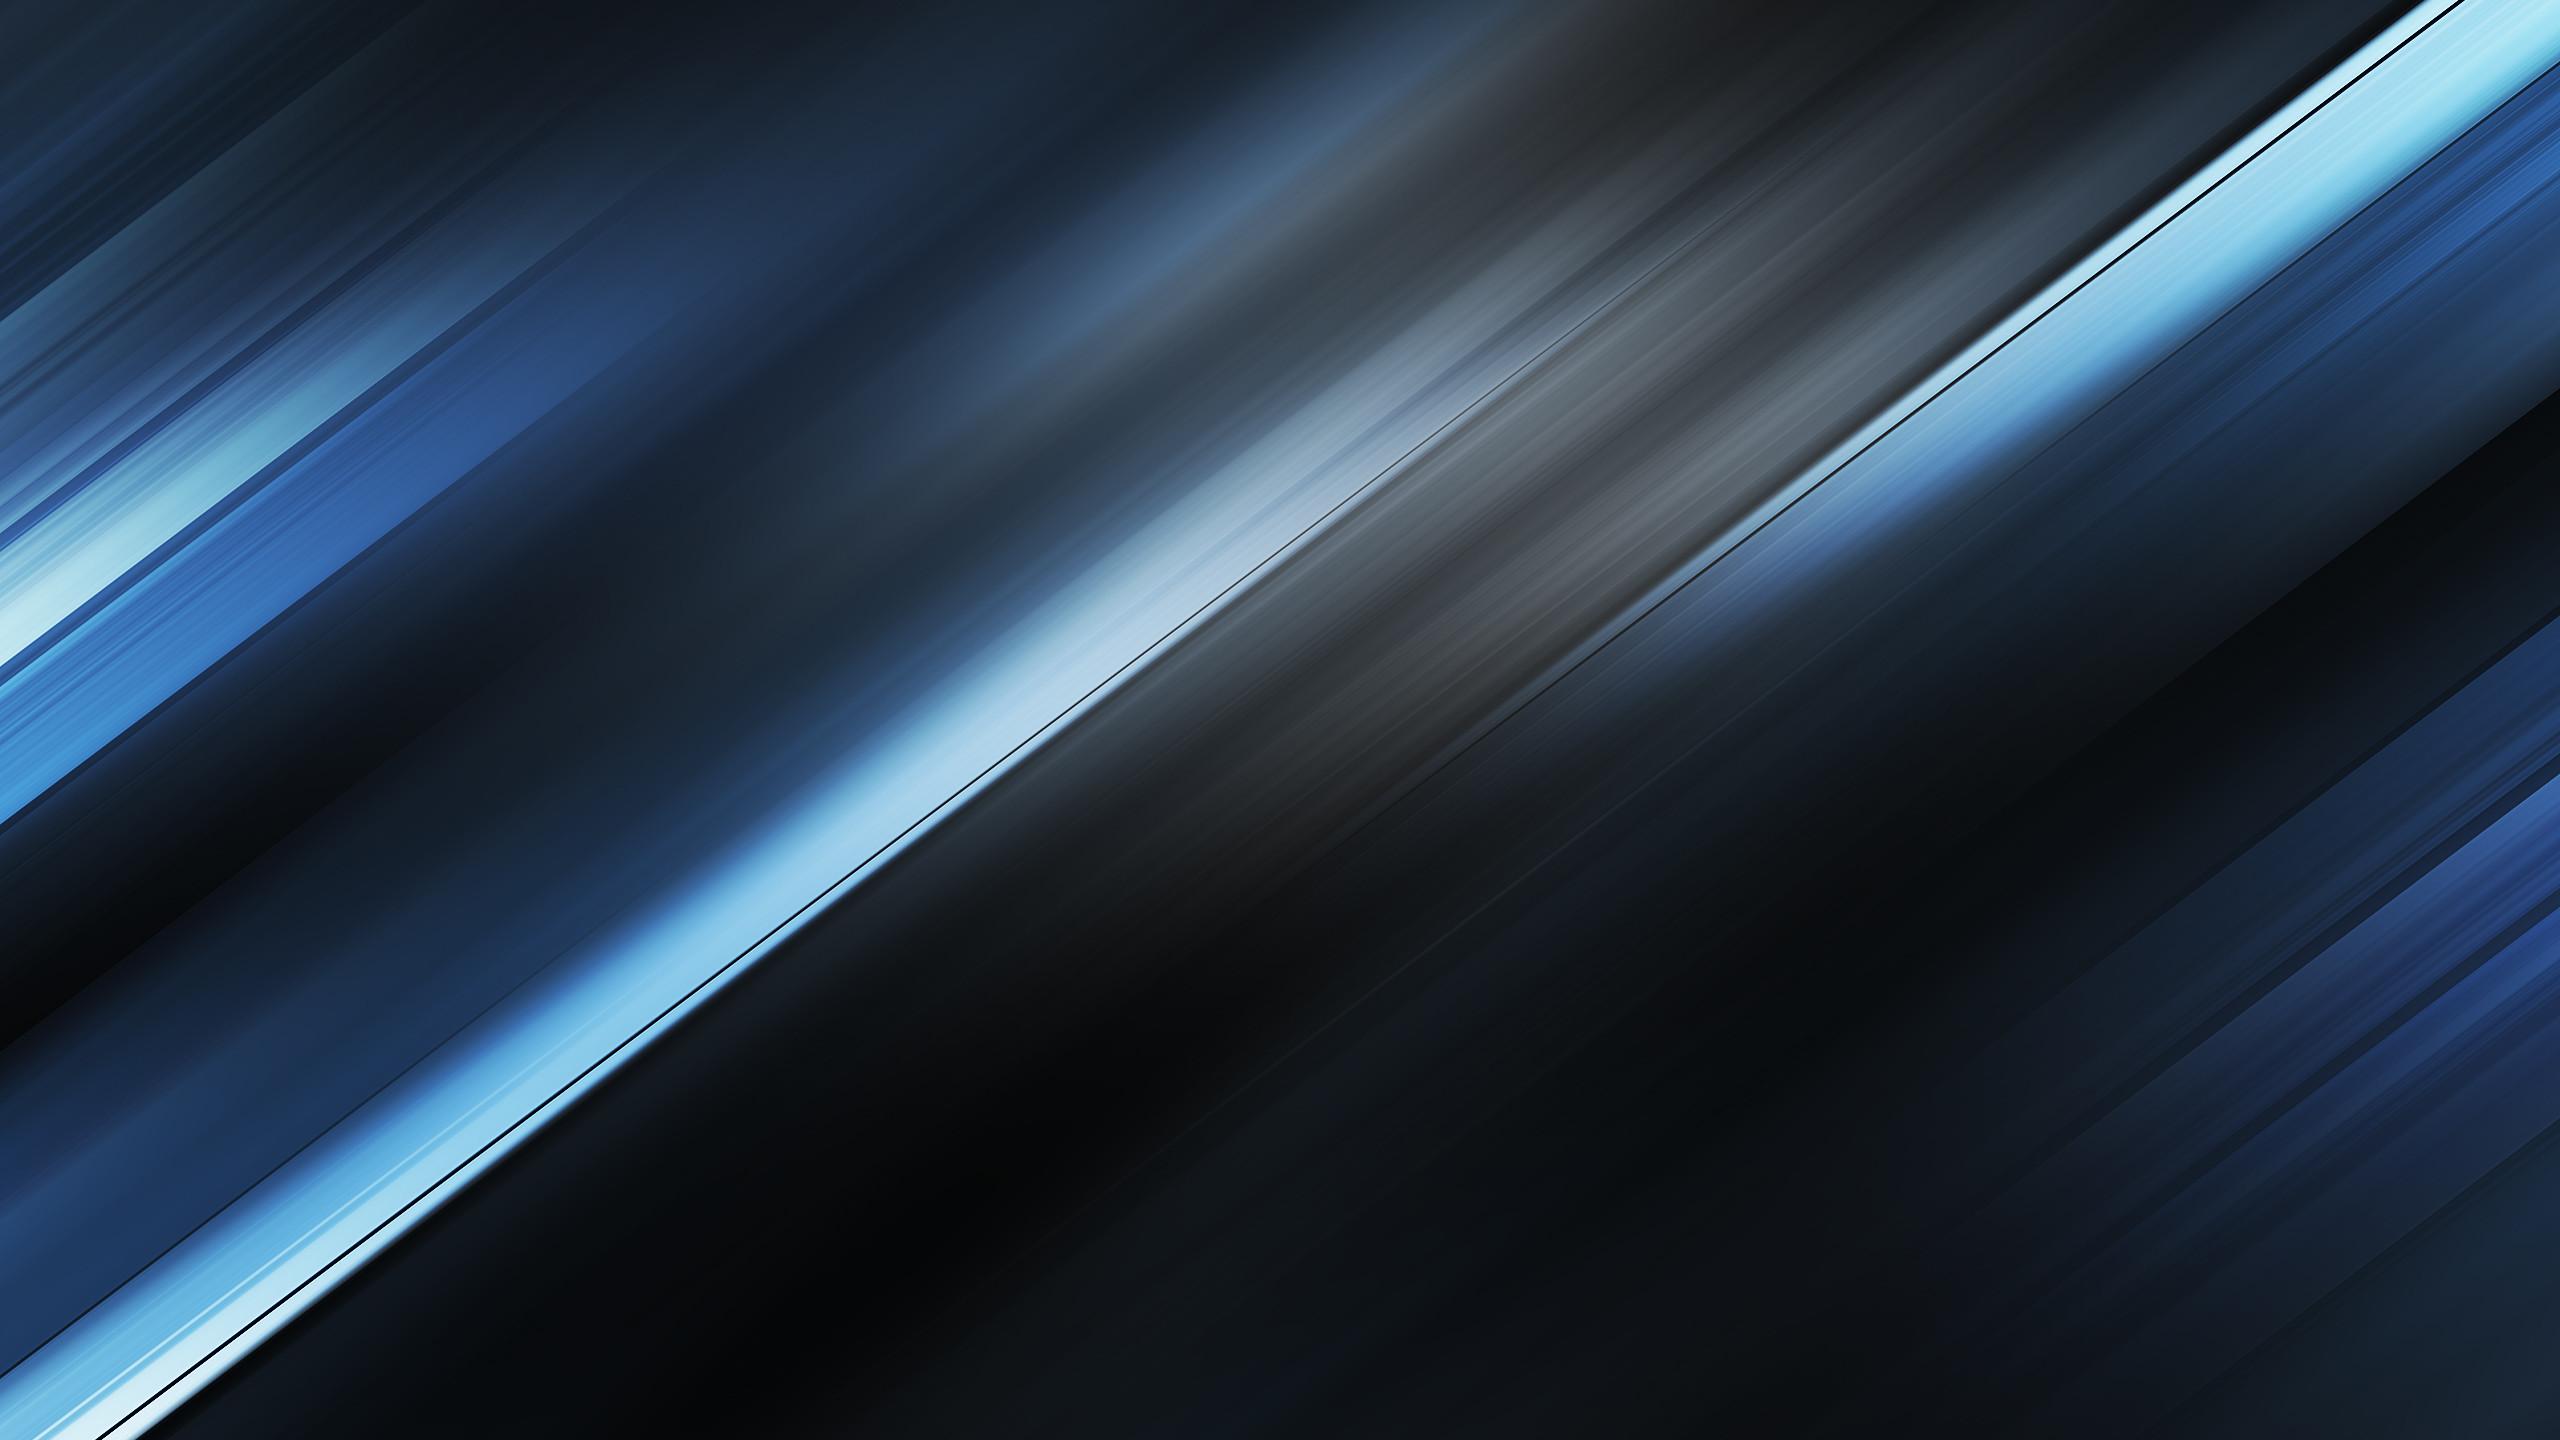 Blue Metallic Background wallpapers HD free – 413843